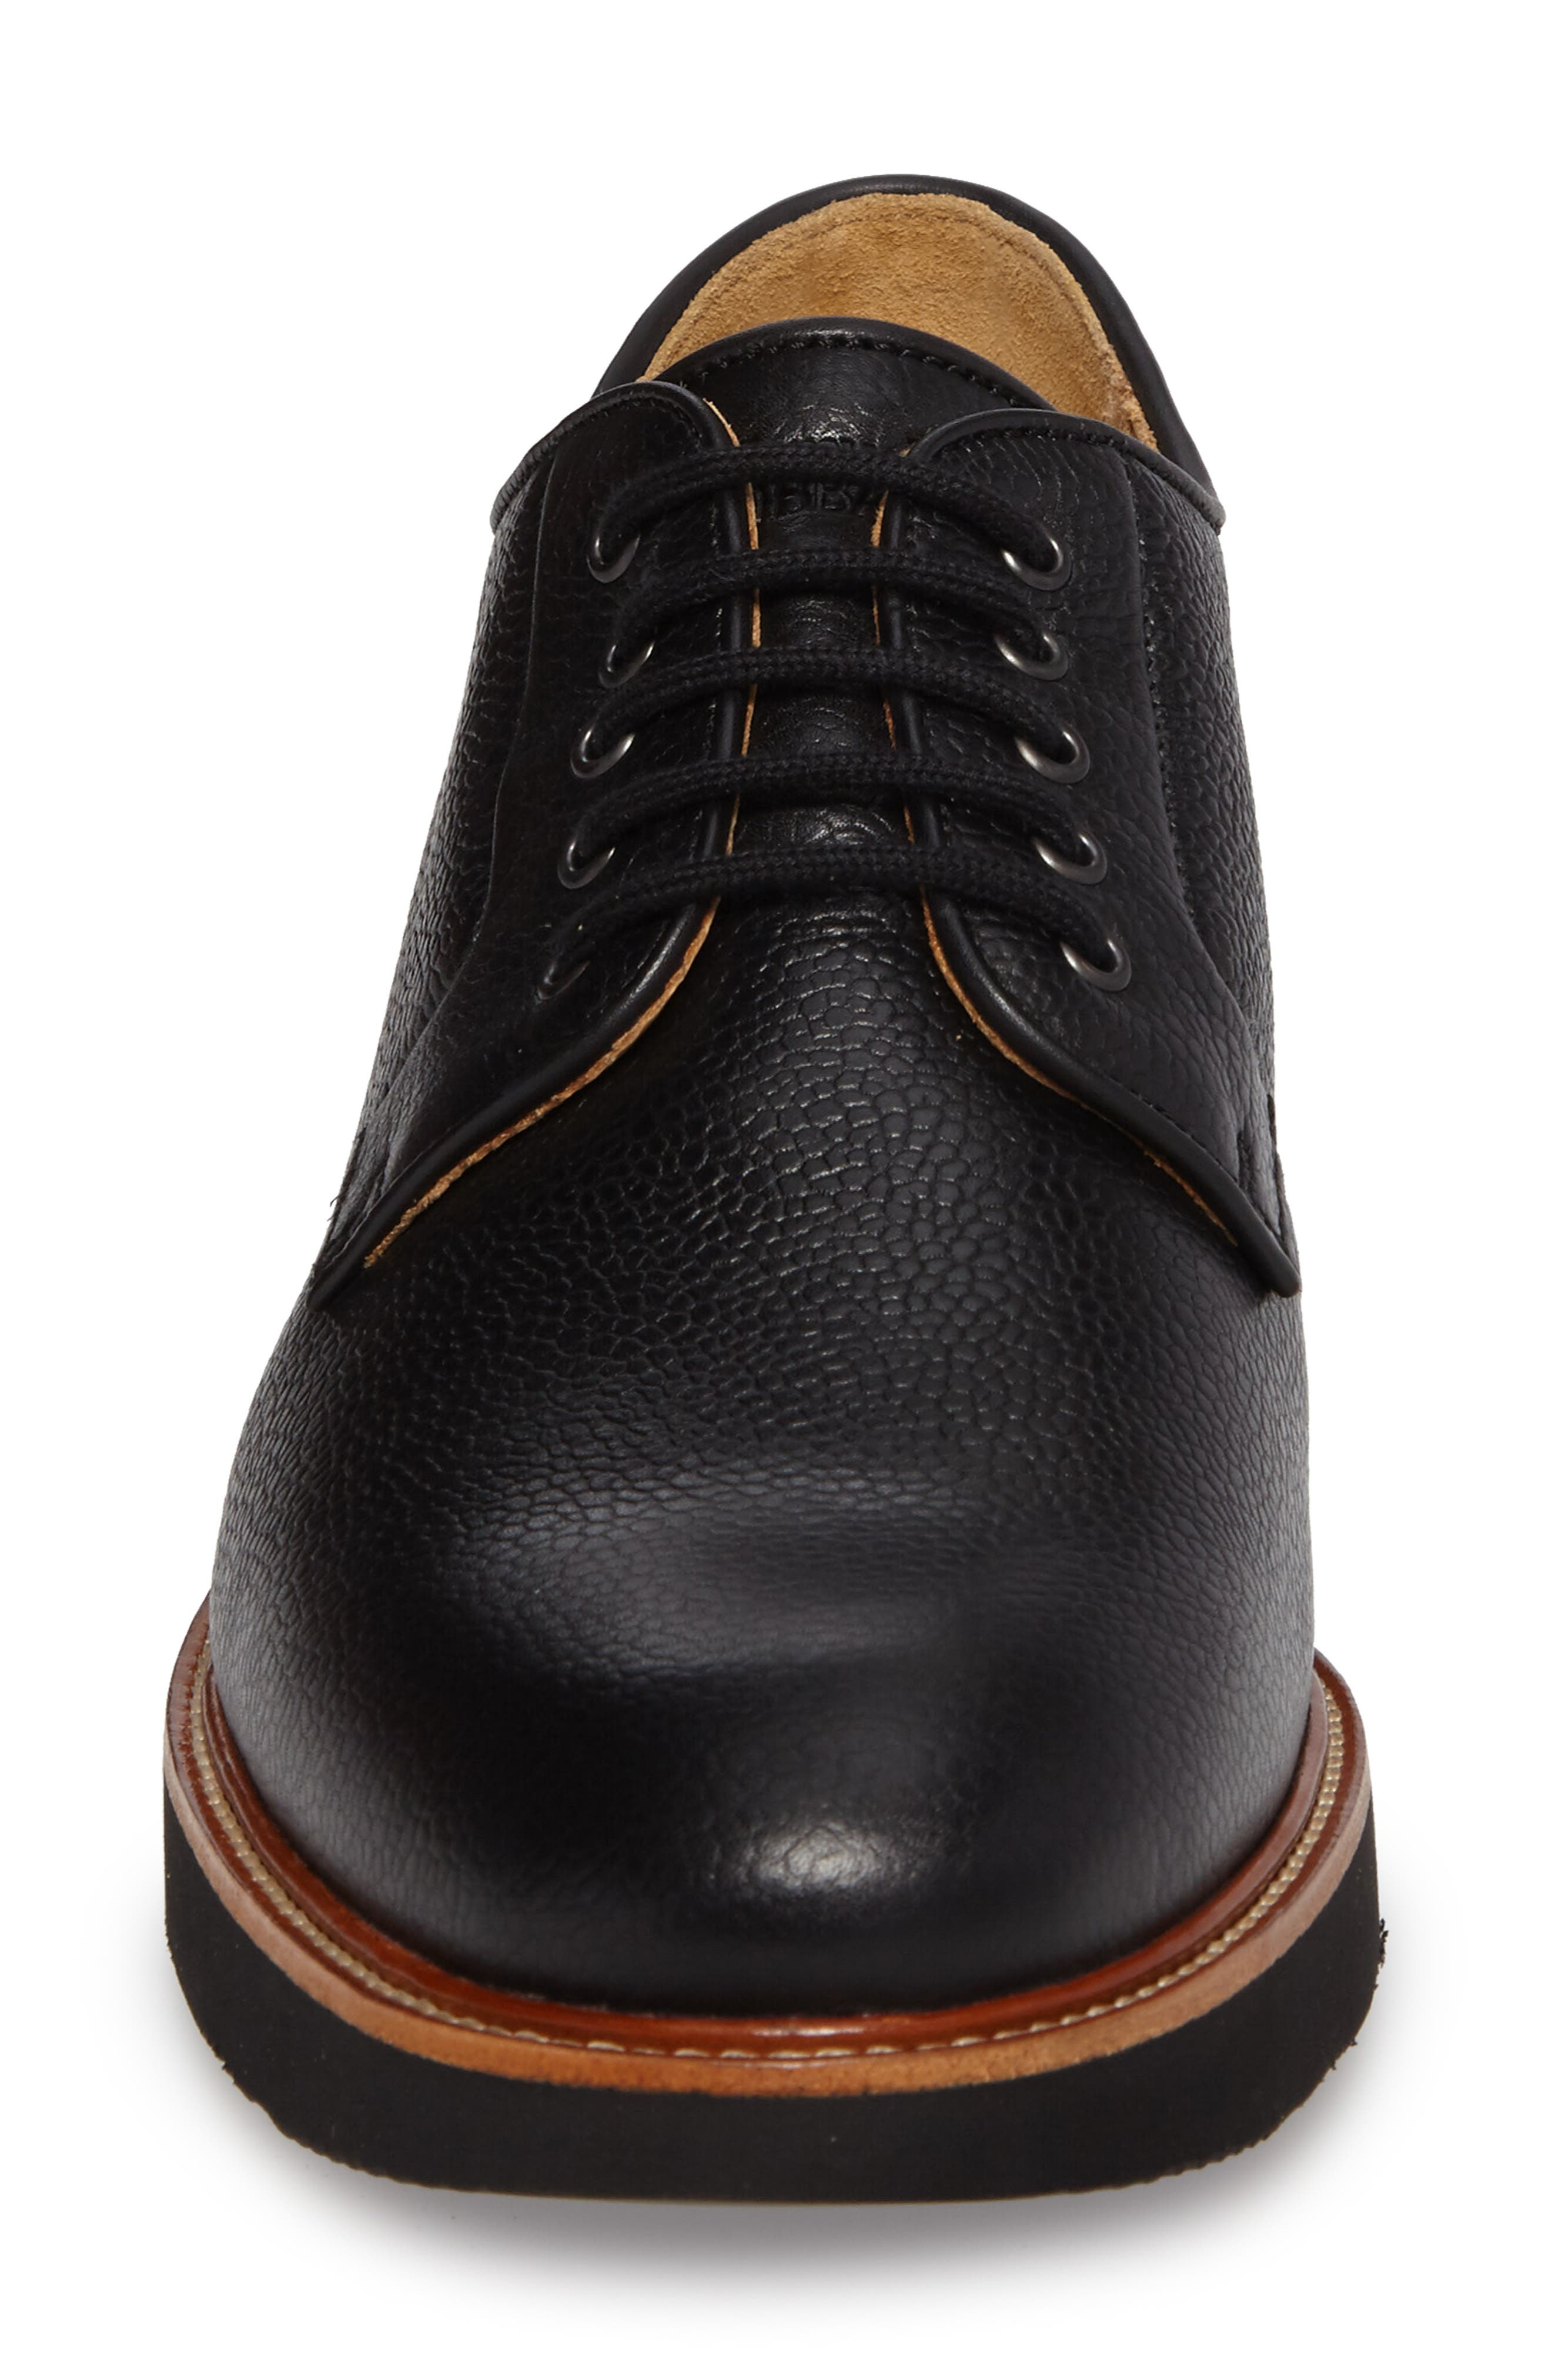 SAMUEL HUBBARD, Highlander Plain Toe Derby, Alternate thumbnail 4, color, BLACK PEBBLE GRAIN